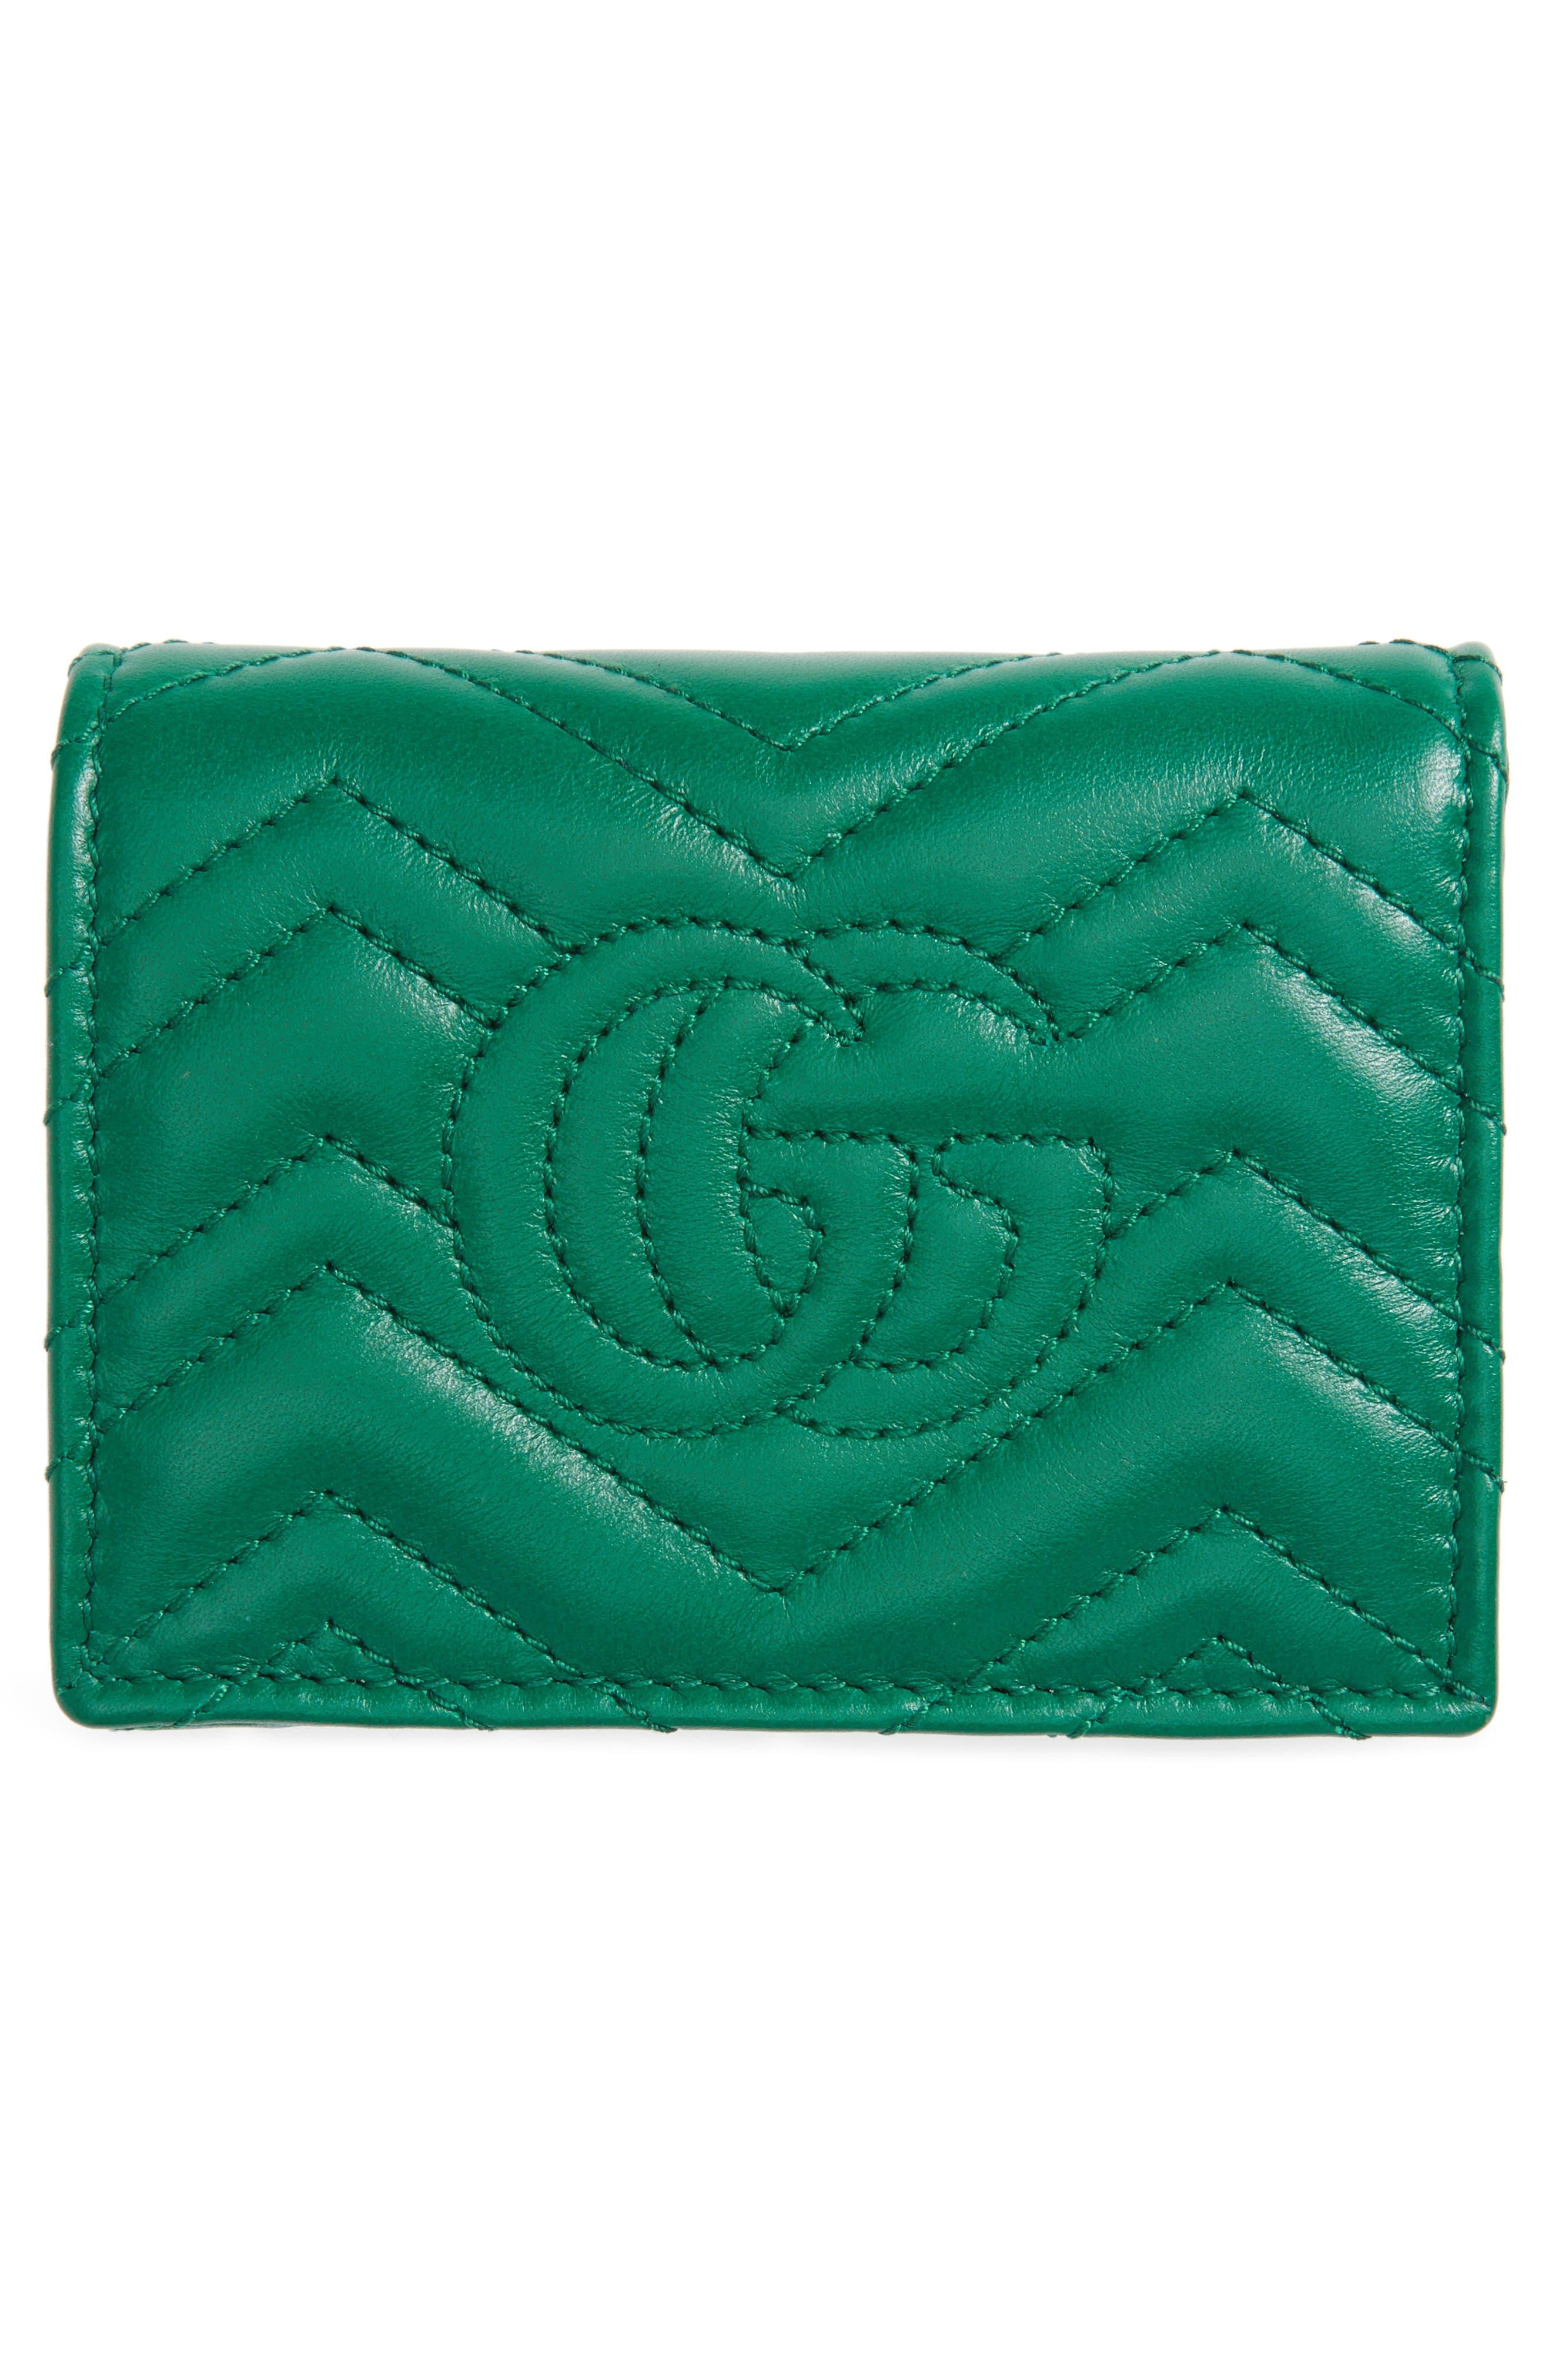 Alternate Image 3  - Gucci GG Marmont Matelassé Leather Card Case